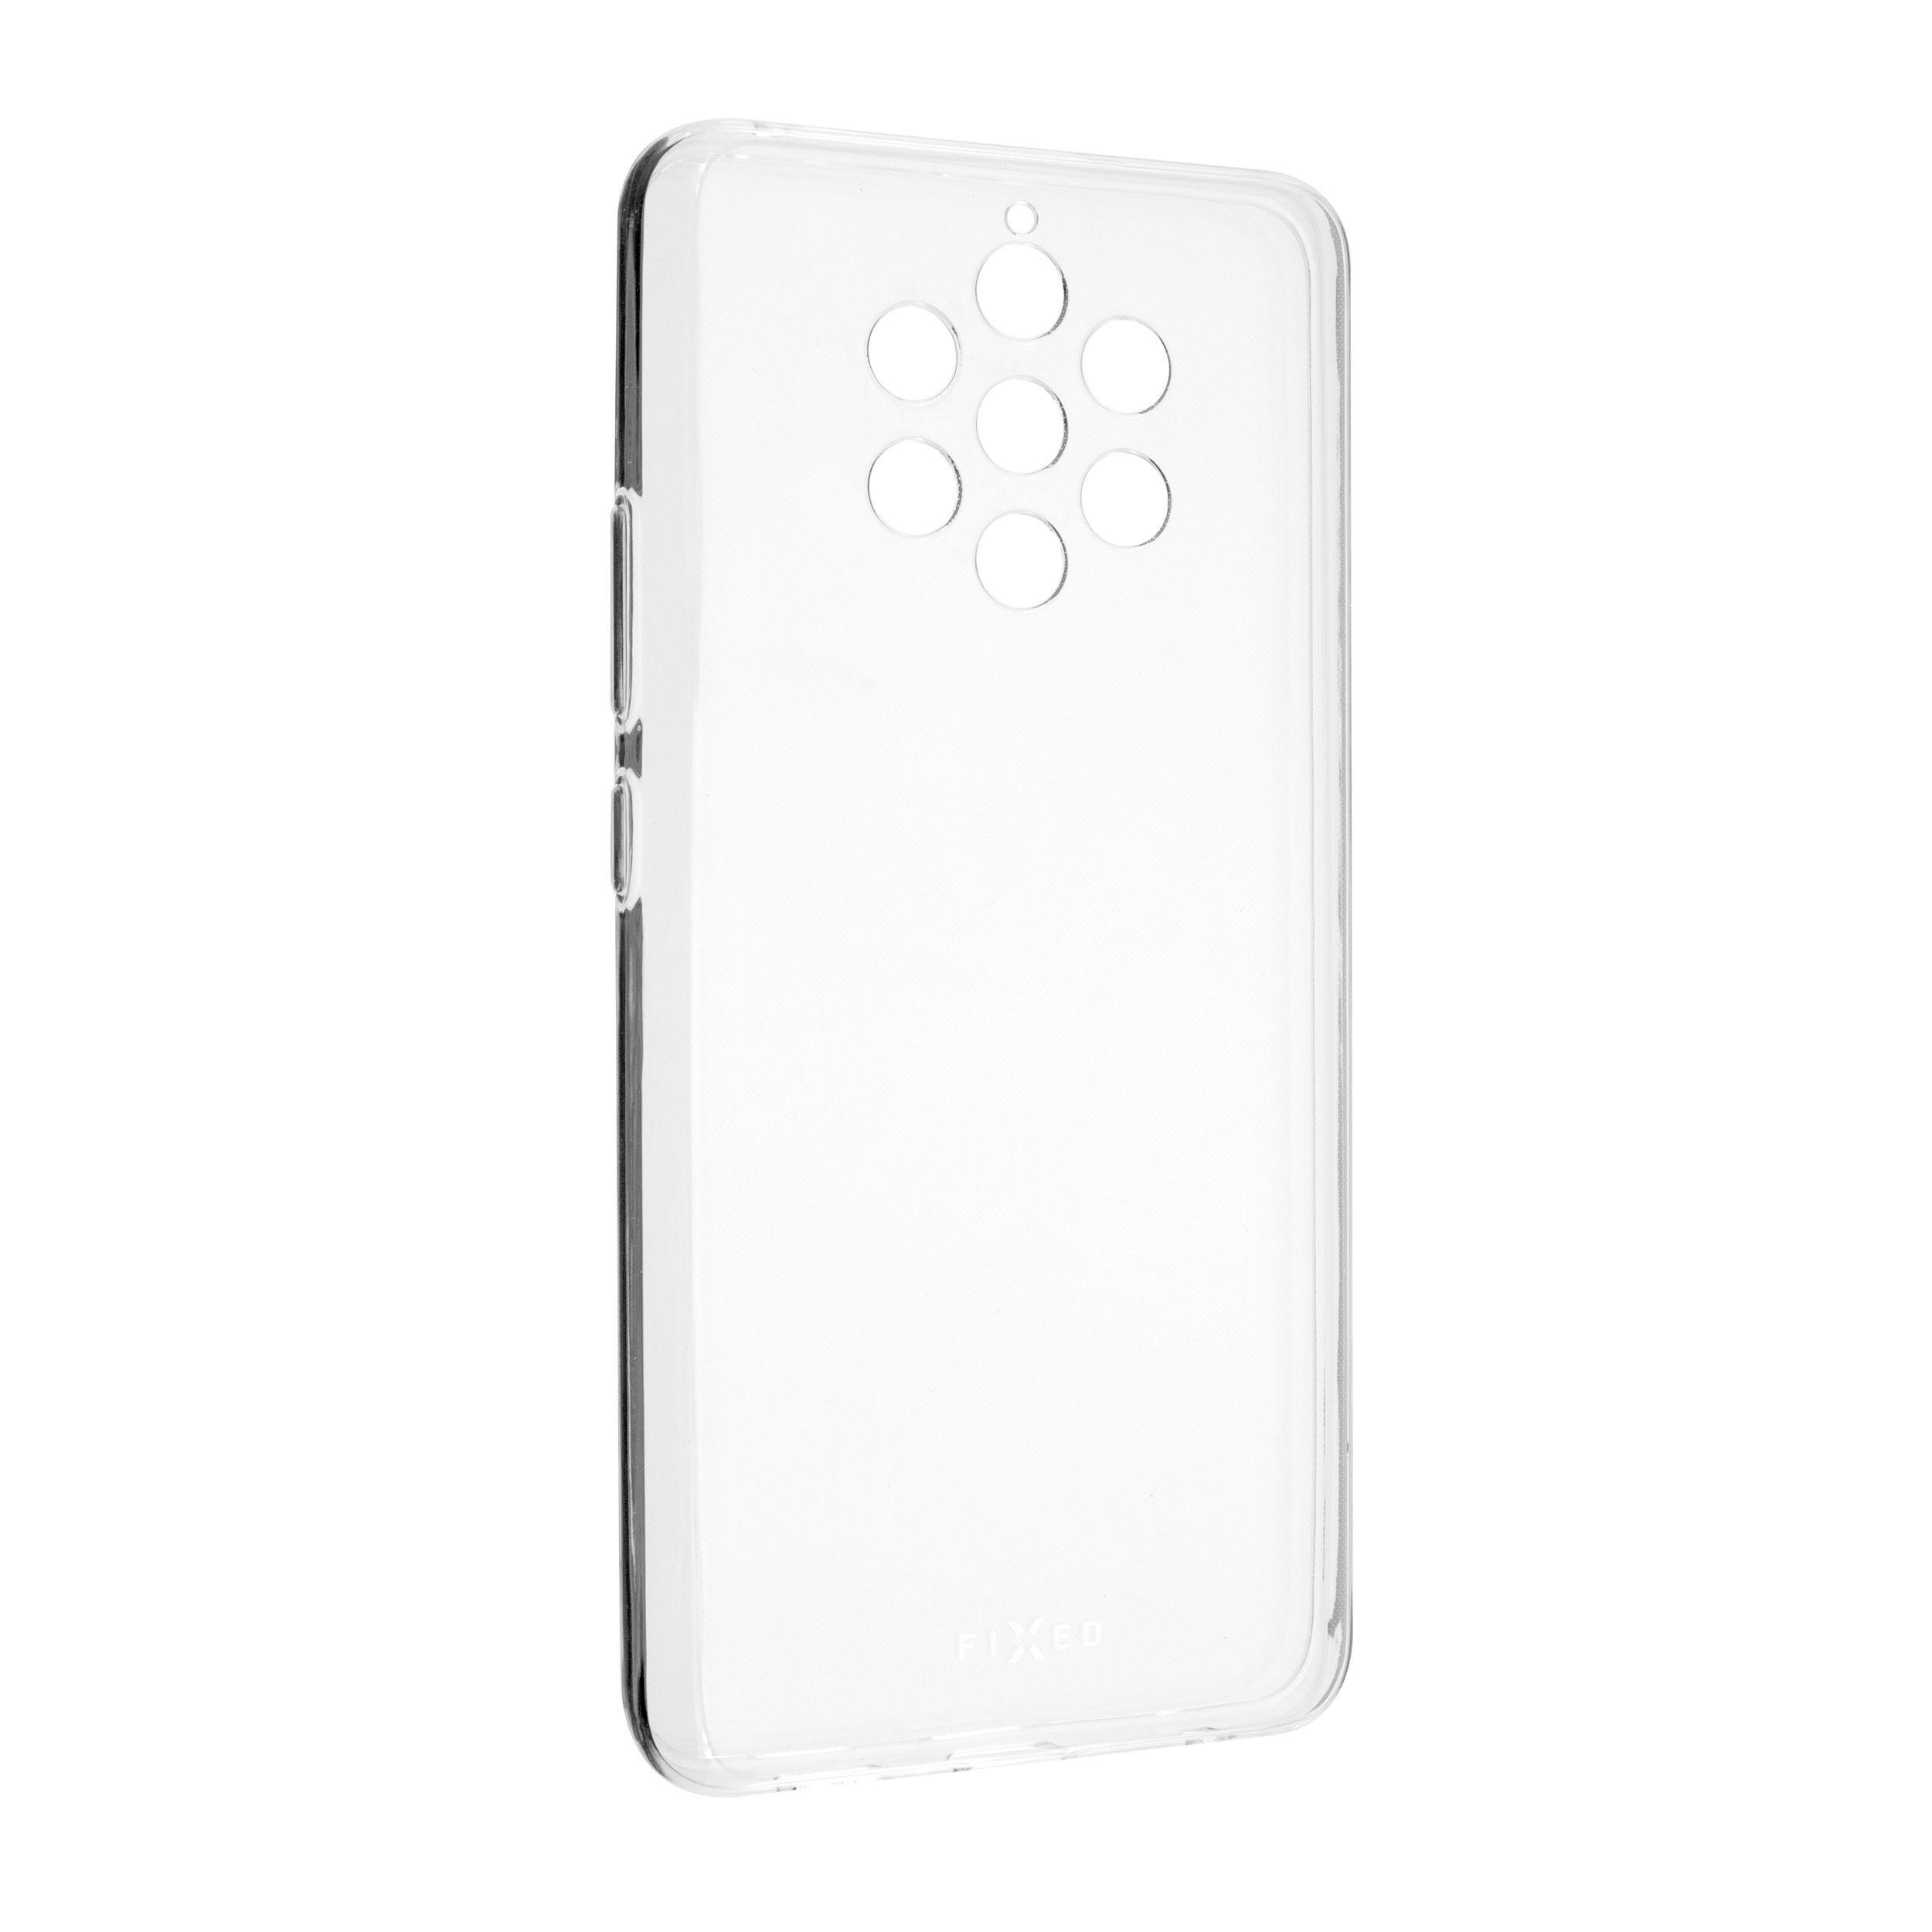 TPU gelové pouzdro FIXED pro Nokia 9 Pureview, čiré